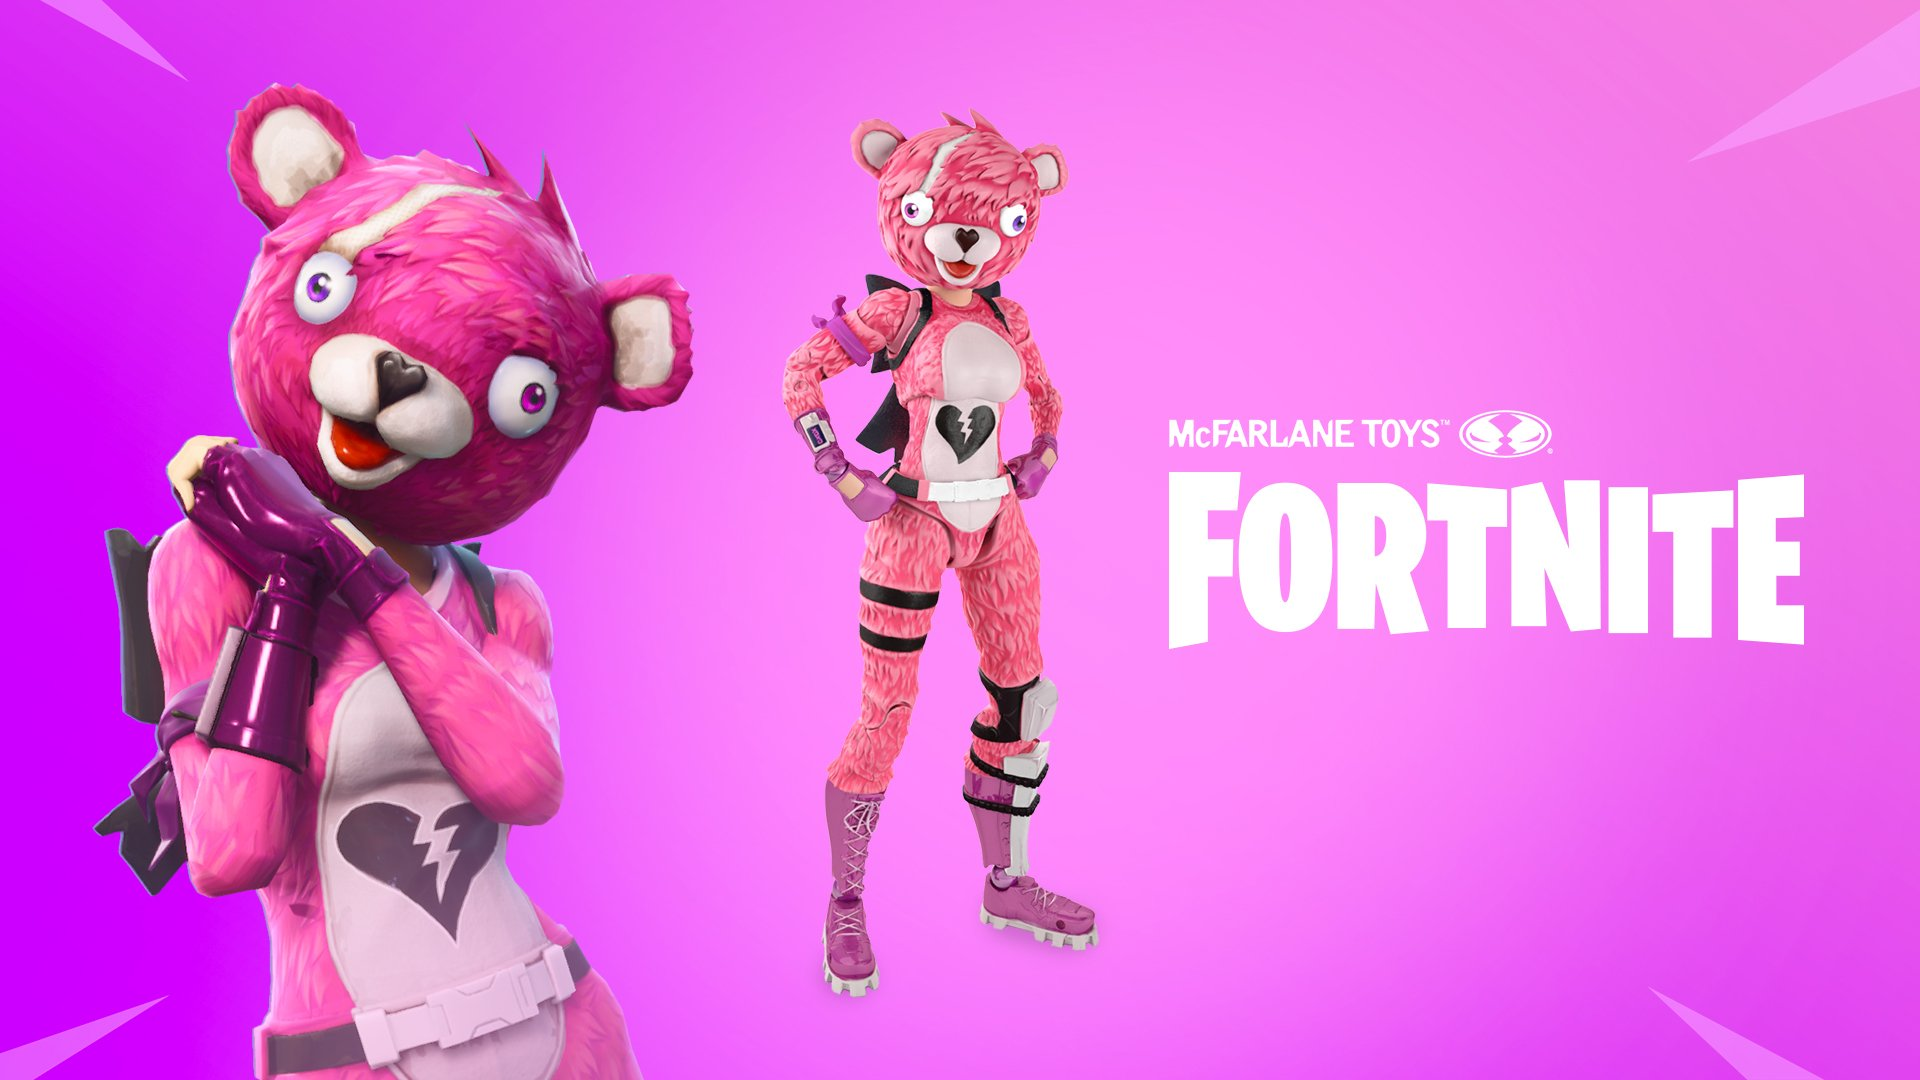 McFarlane produira des figurines Fortnite à collectionner